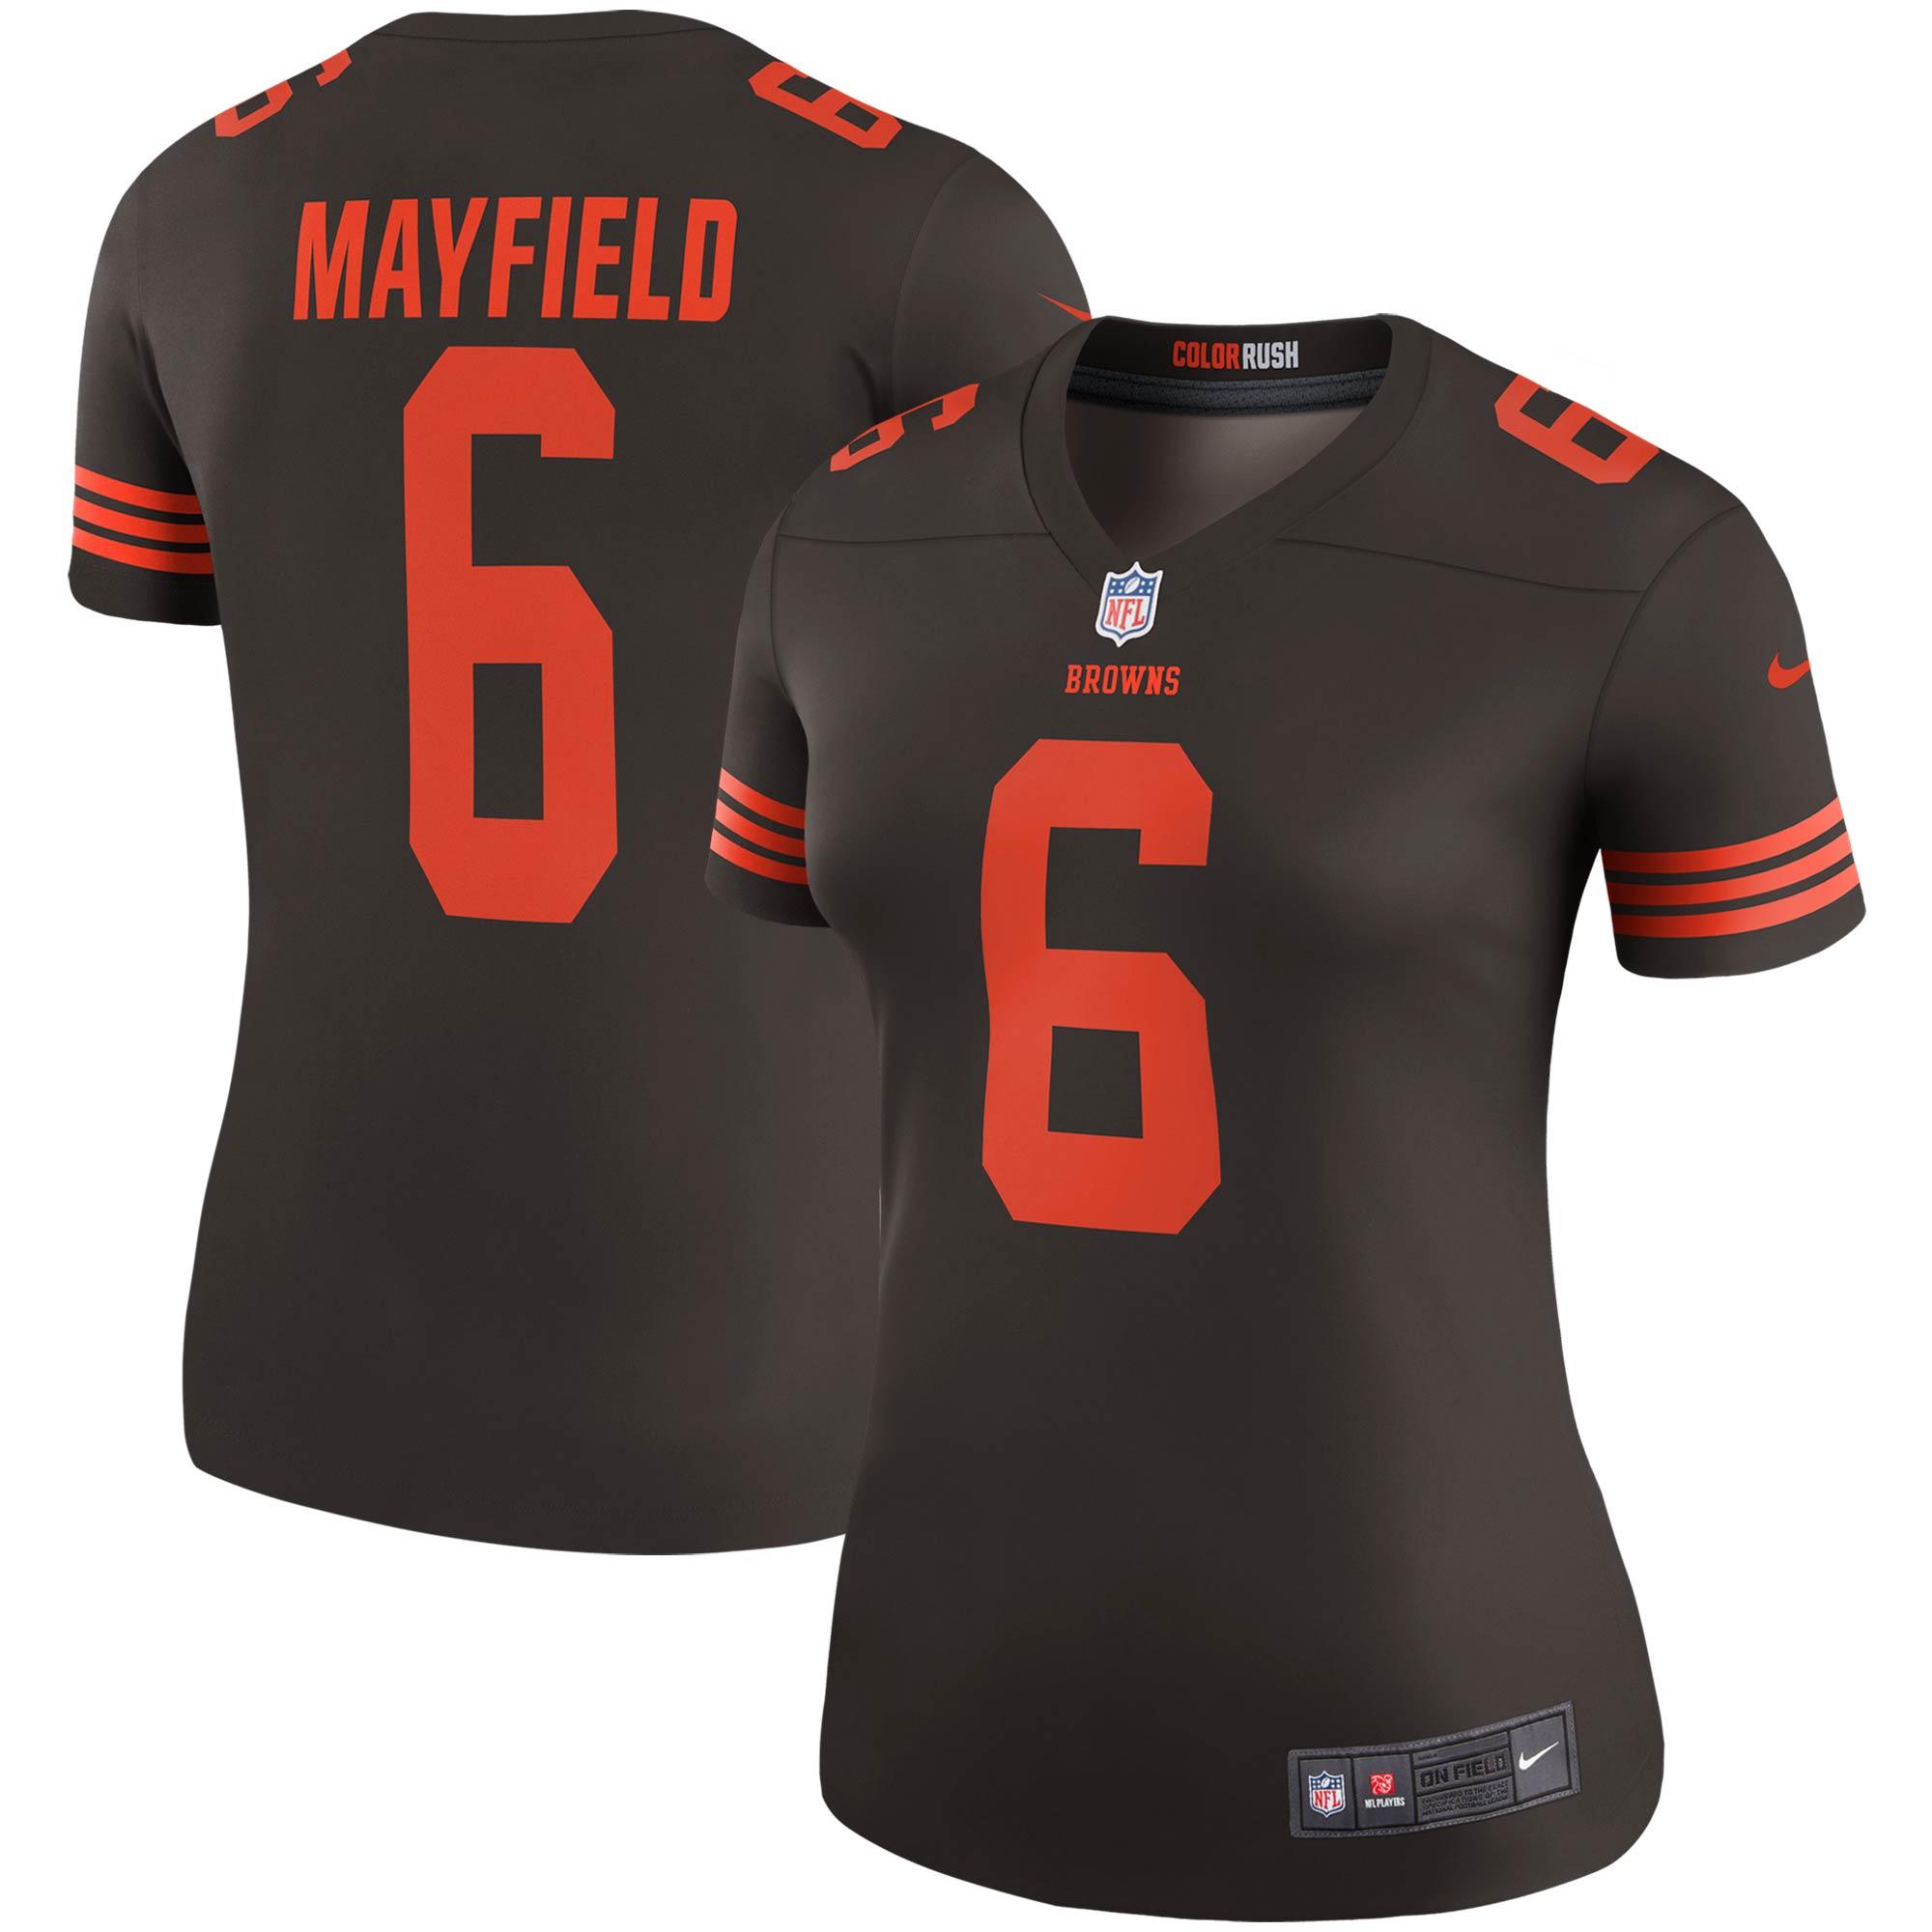 Baker Mayfield Cleveland Browns Nike Women's Player Legend Jersey - Brown